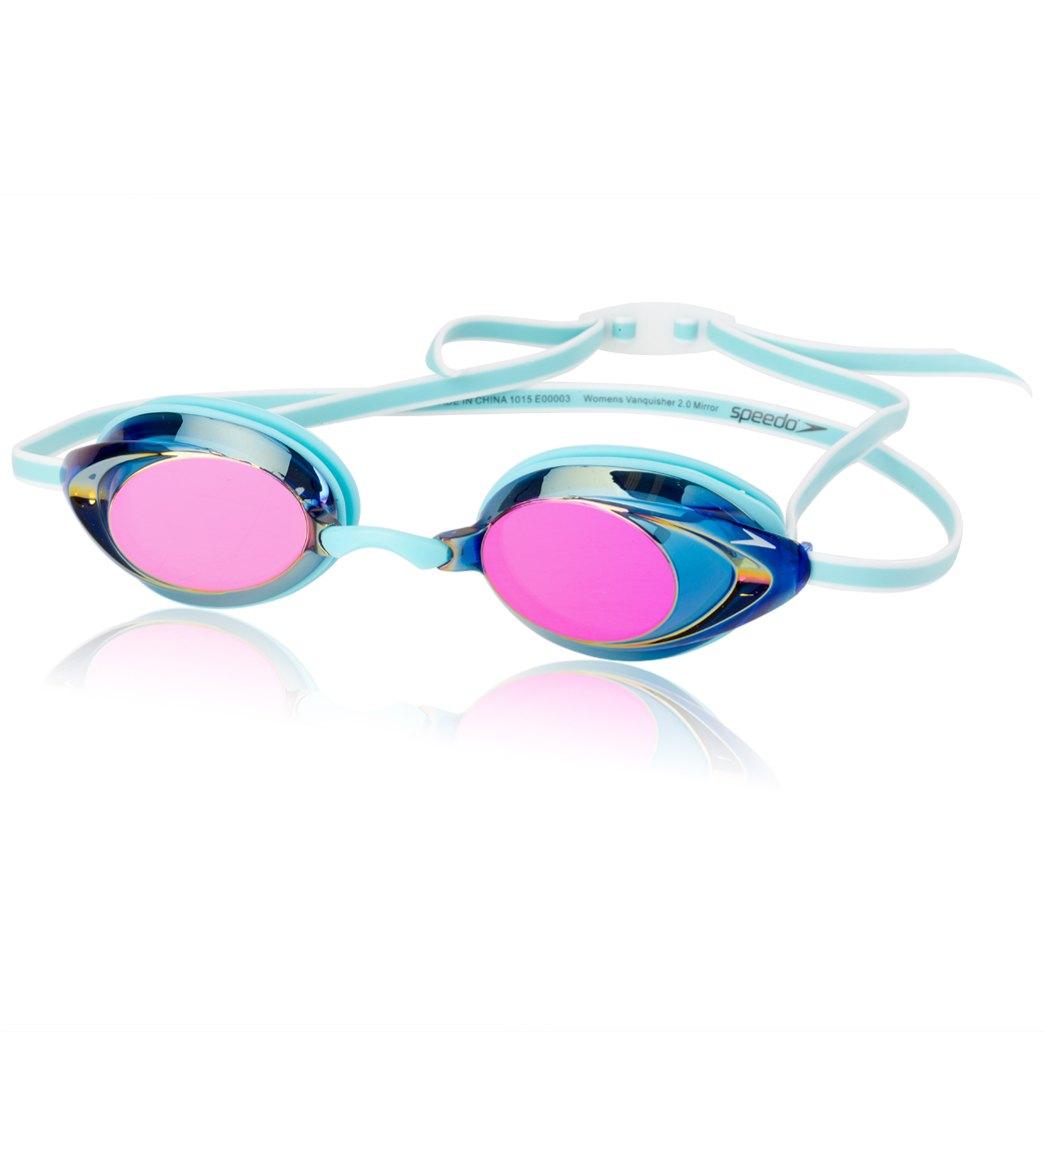 2d330aed7c Speedo Women s Vanquisher 2.0 Mirrored Goggle at SwimOutlet.com